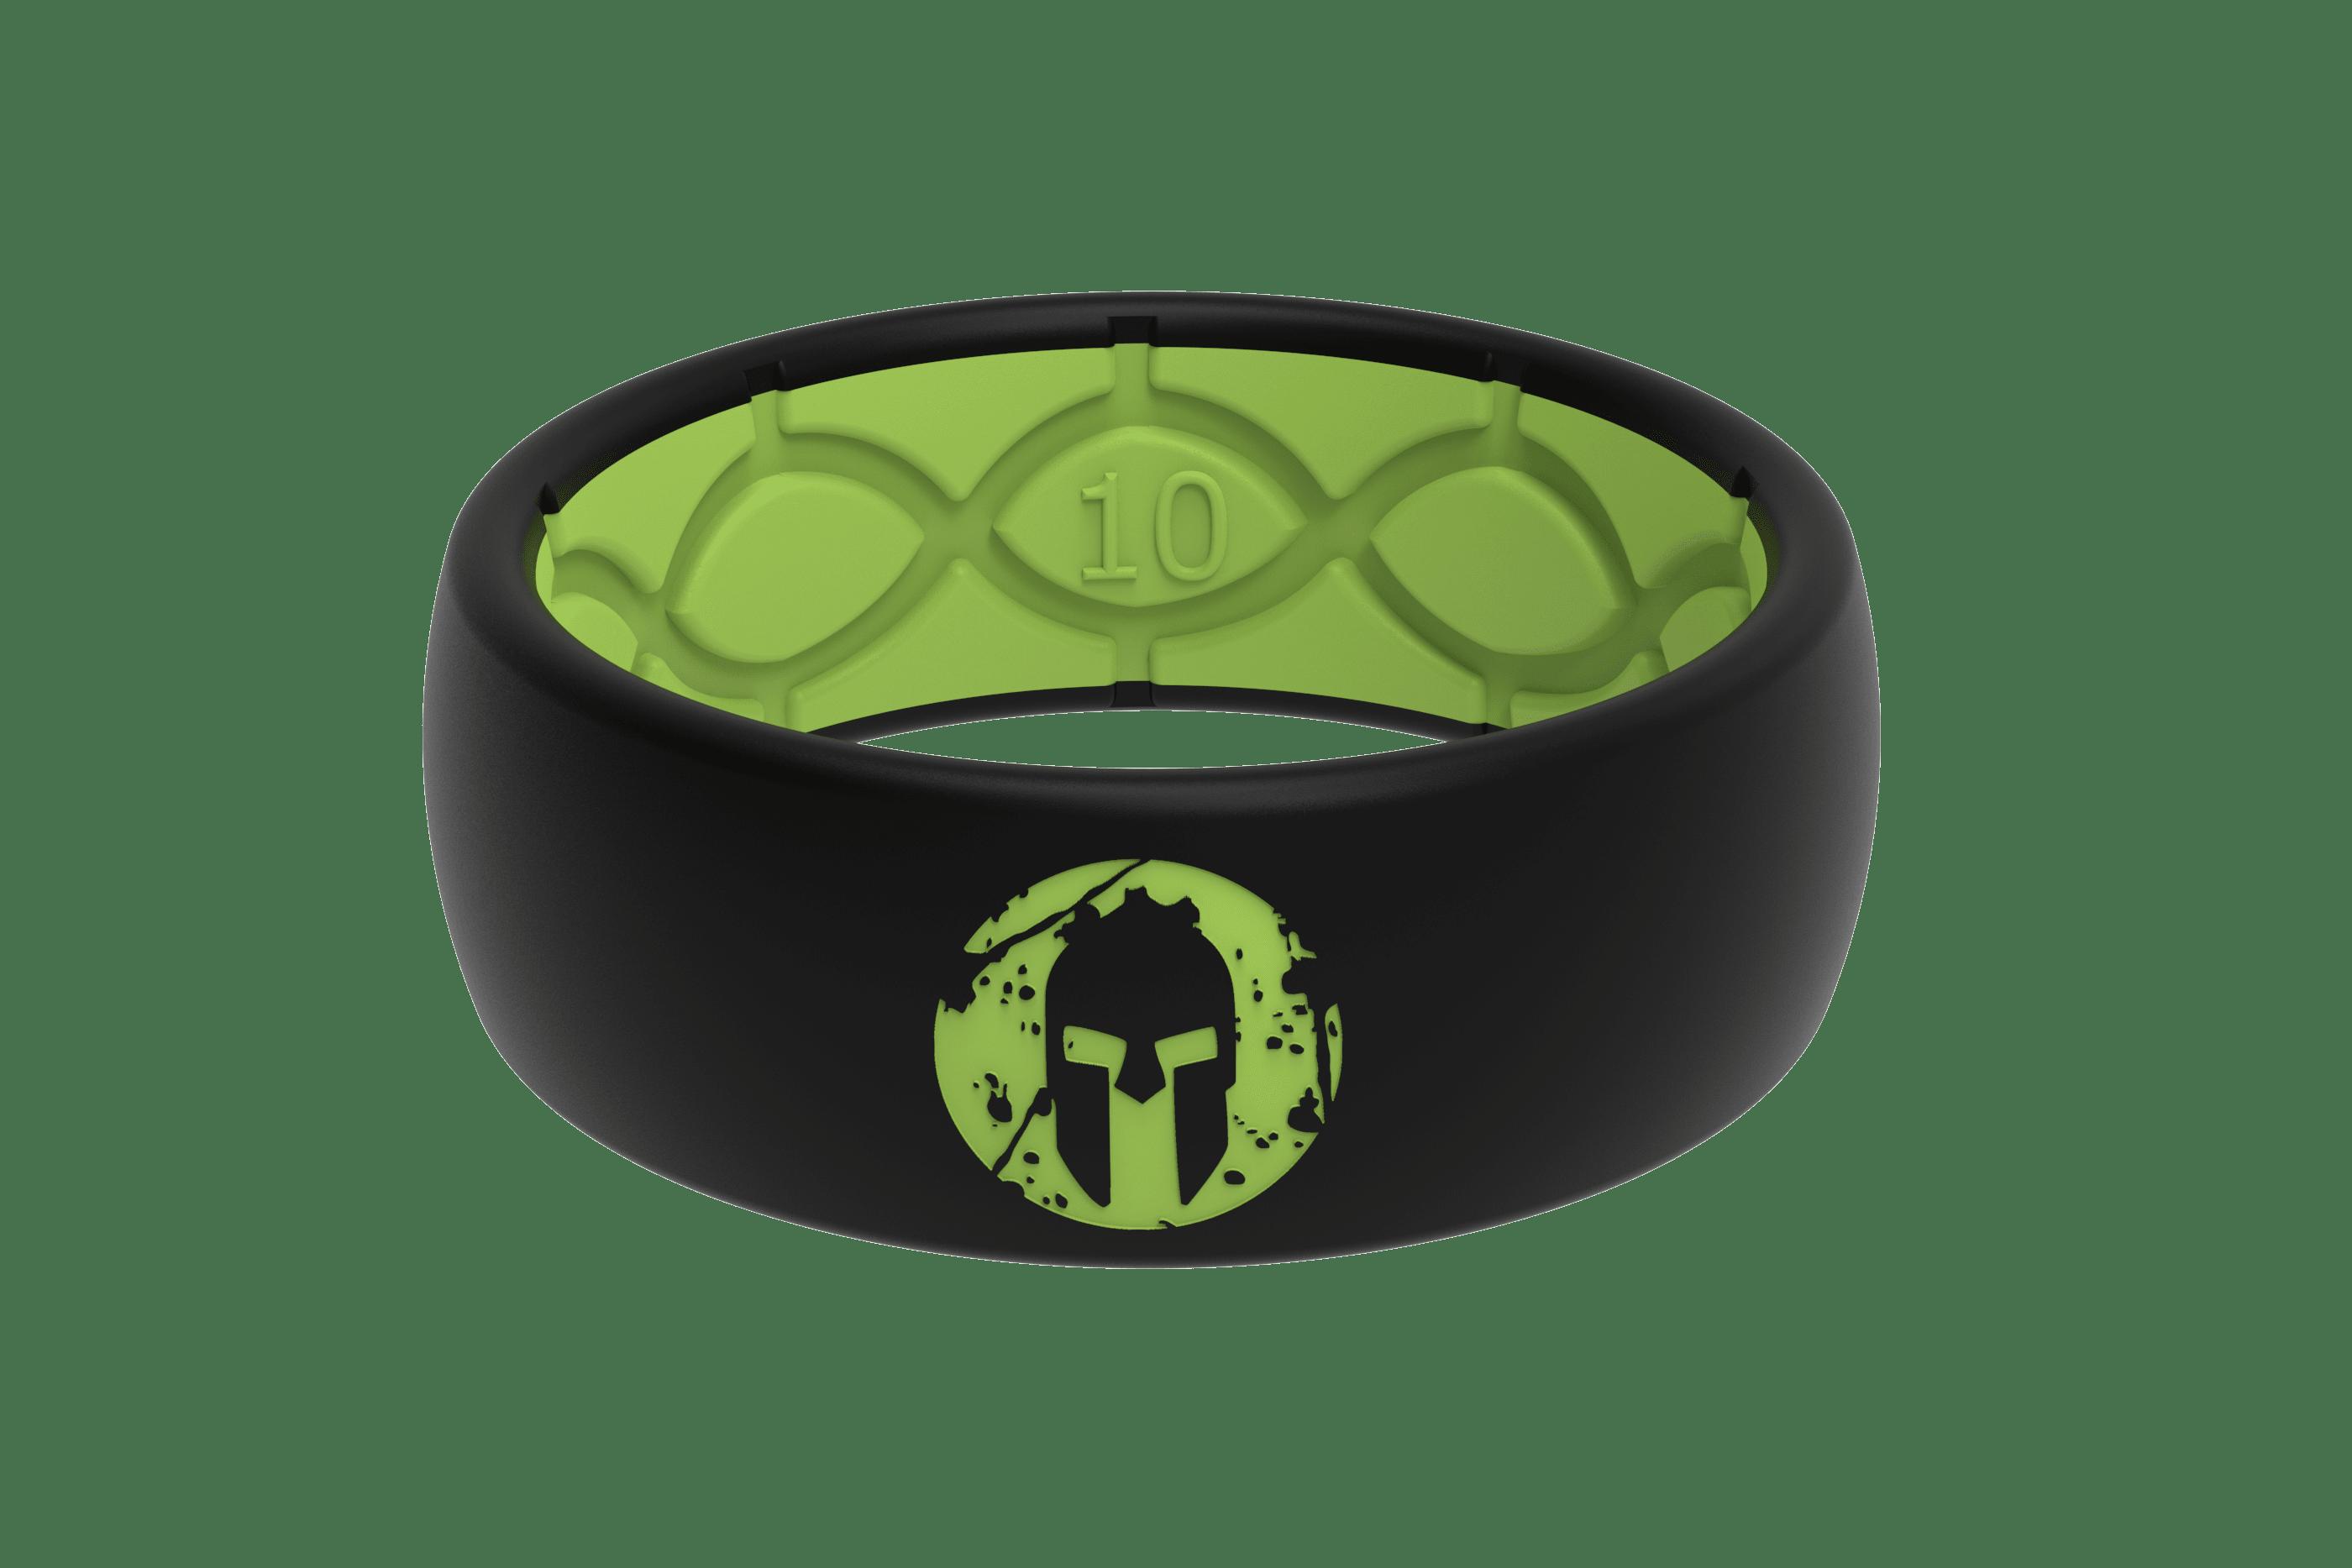 Original Spartan Beast Green  viewed front on